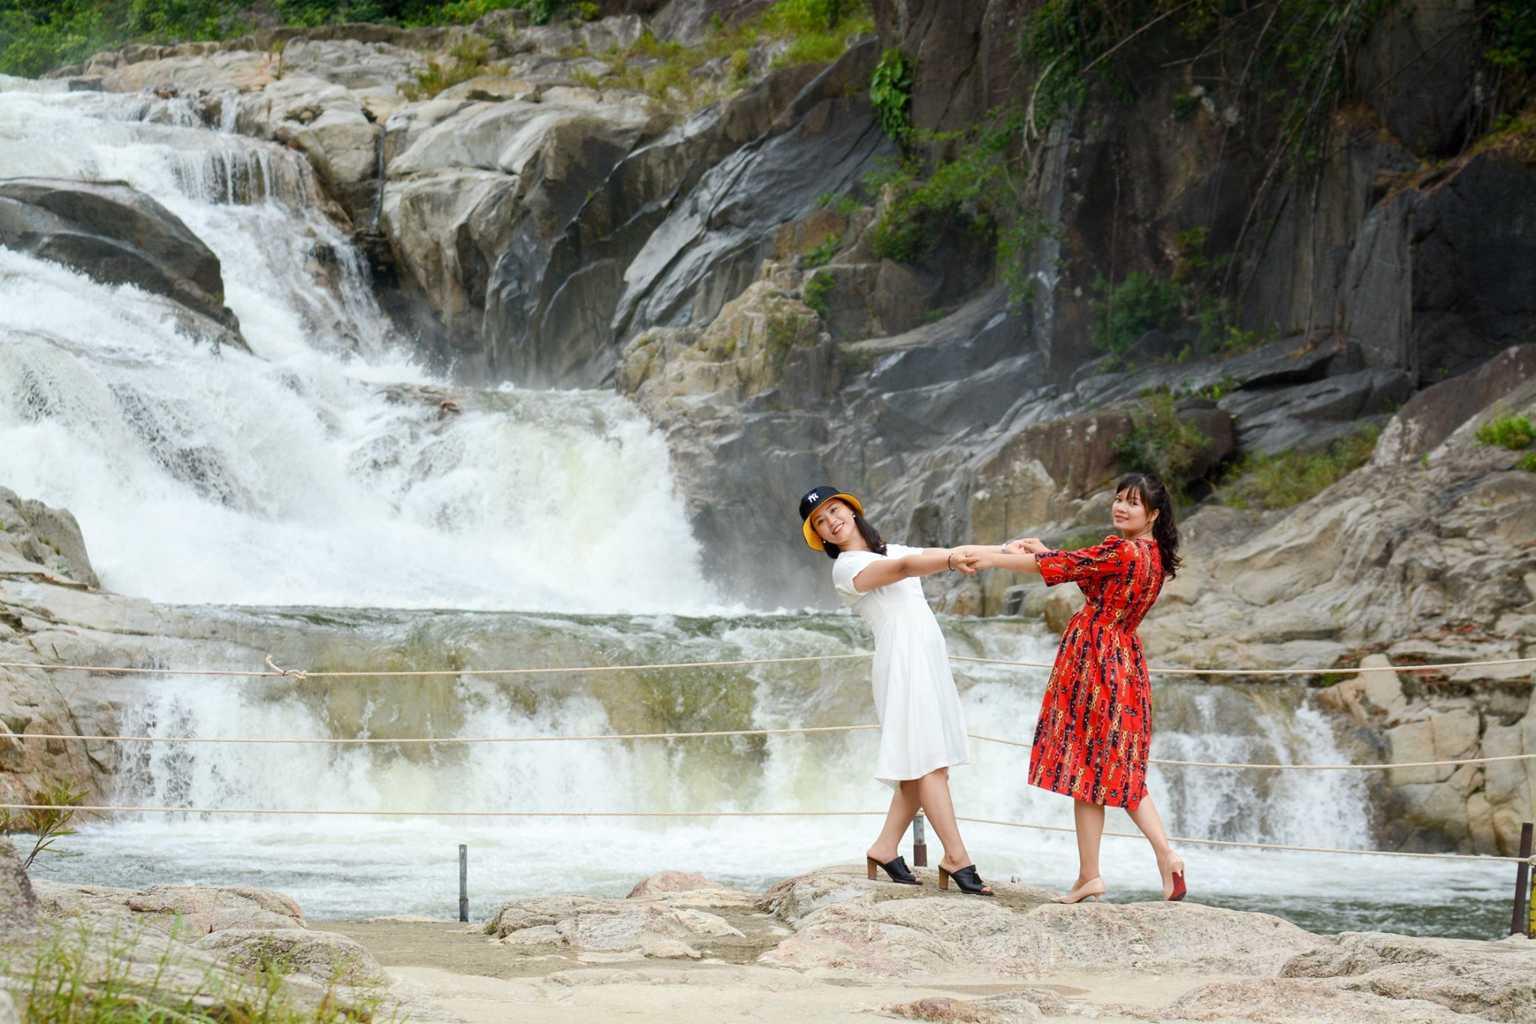 vietnam waterfalls - yang bay waterfall 2